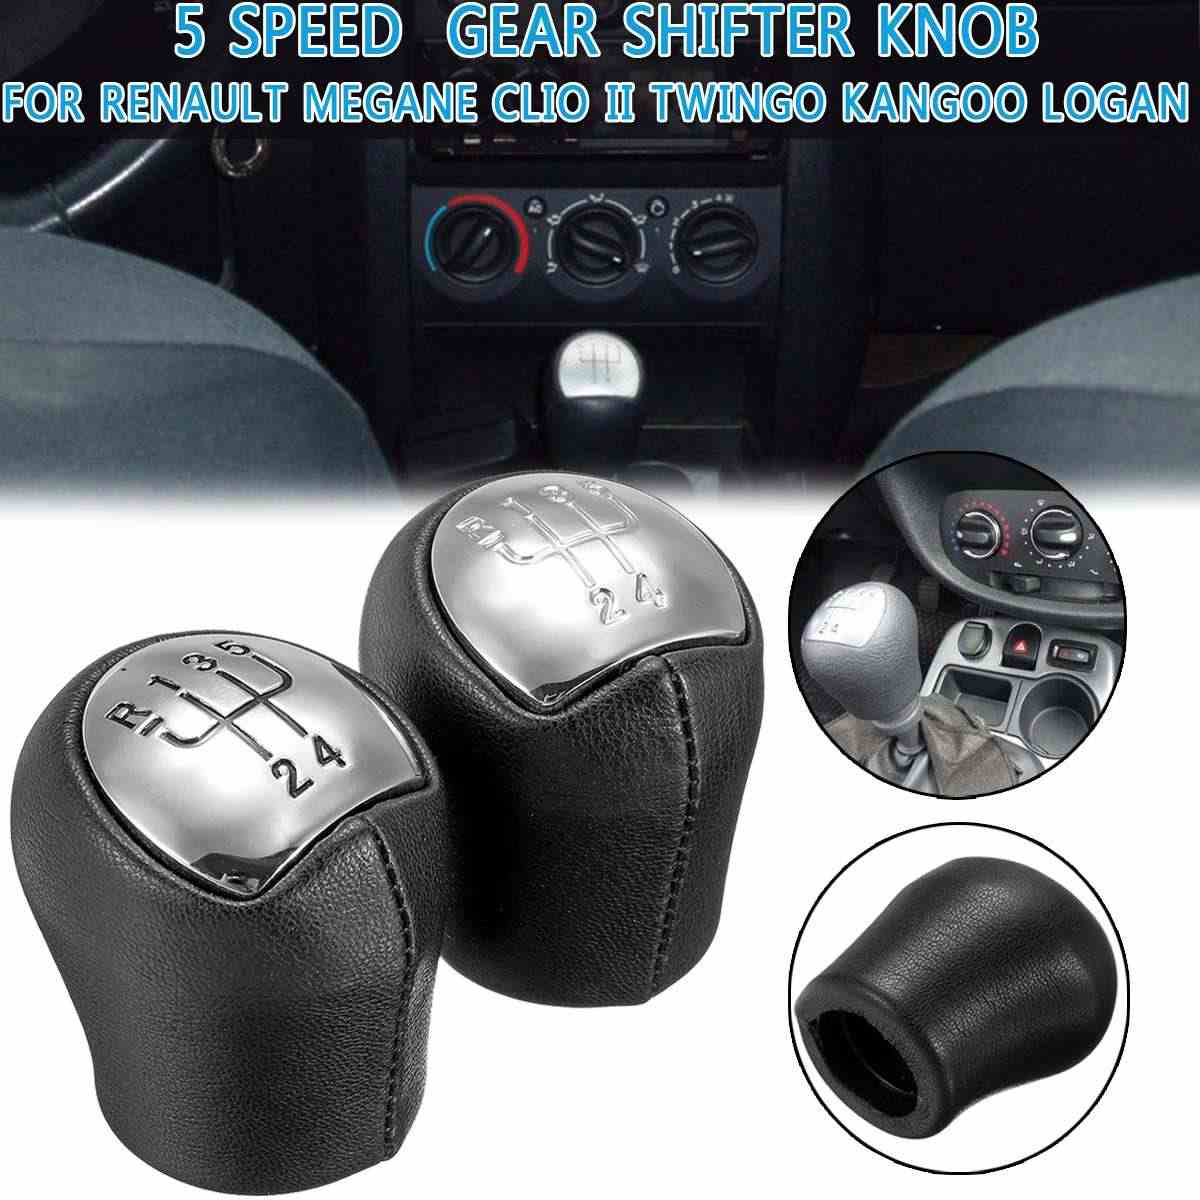 10 mm PU-Gloss Auto 5 Geschwindigkeit Handbuch Schaltknauf Shifter Universal-Automible